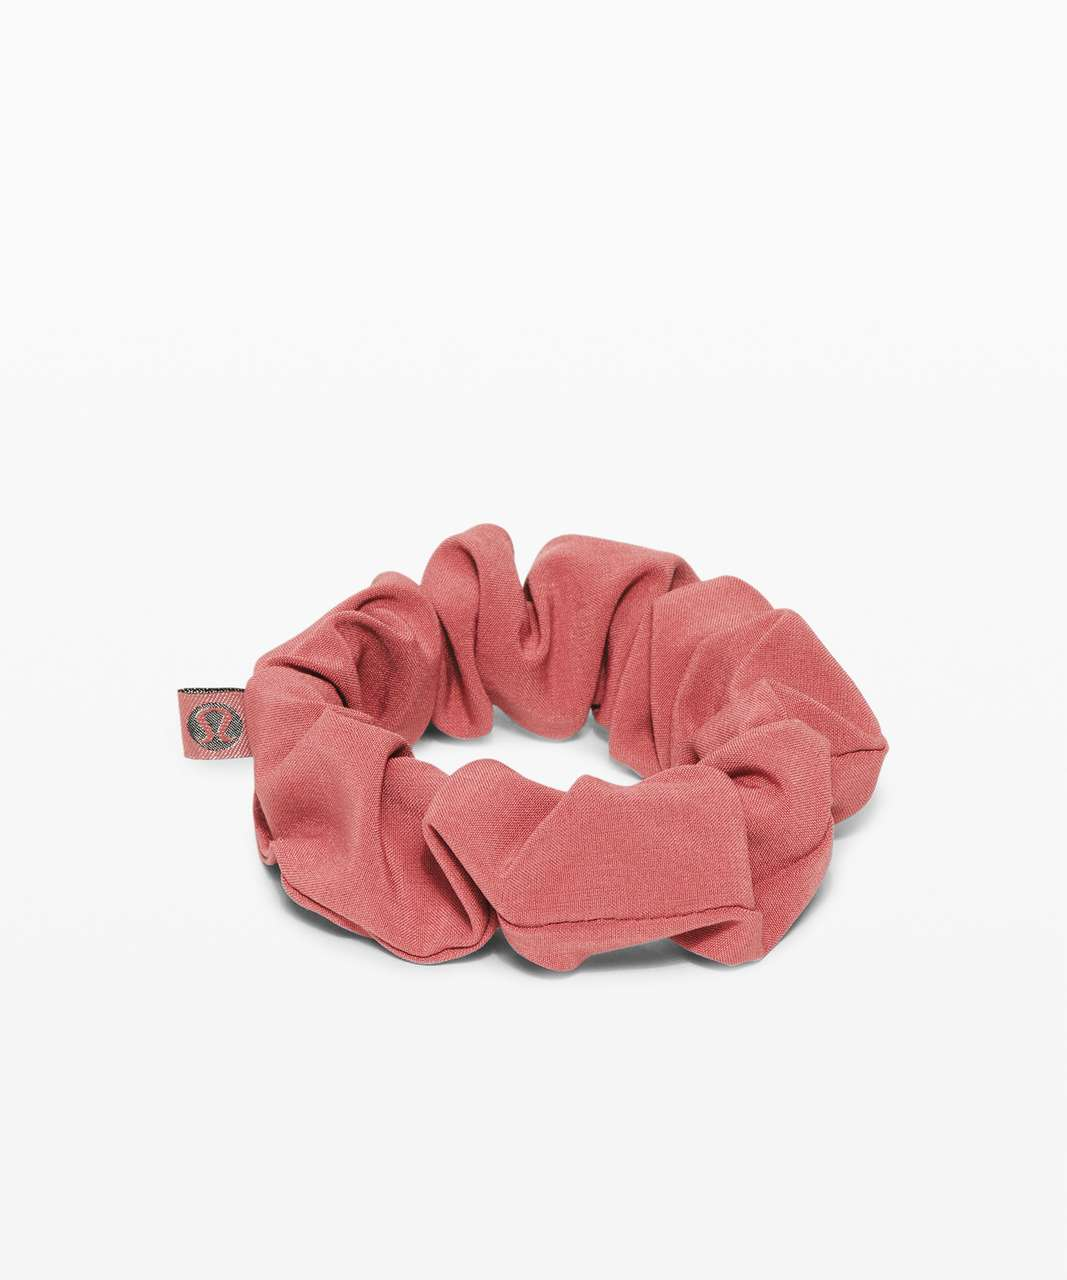 Lululemon Uplifting Scrunchie - Cherry Tint